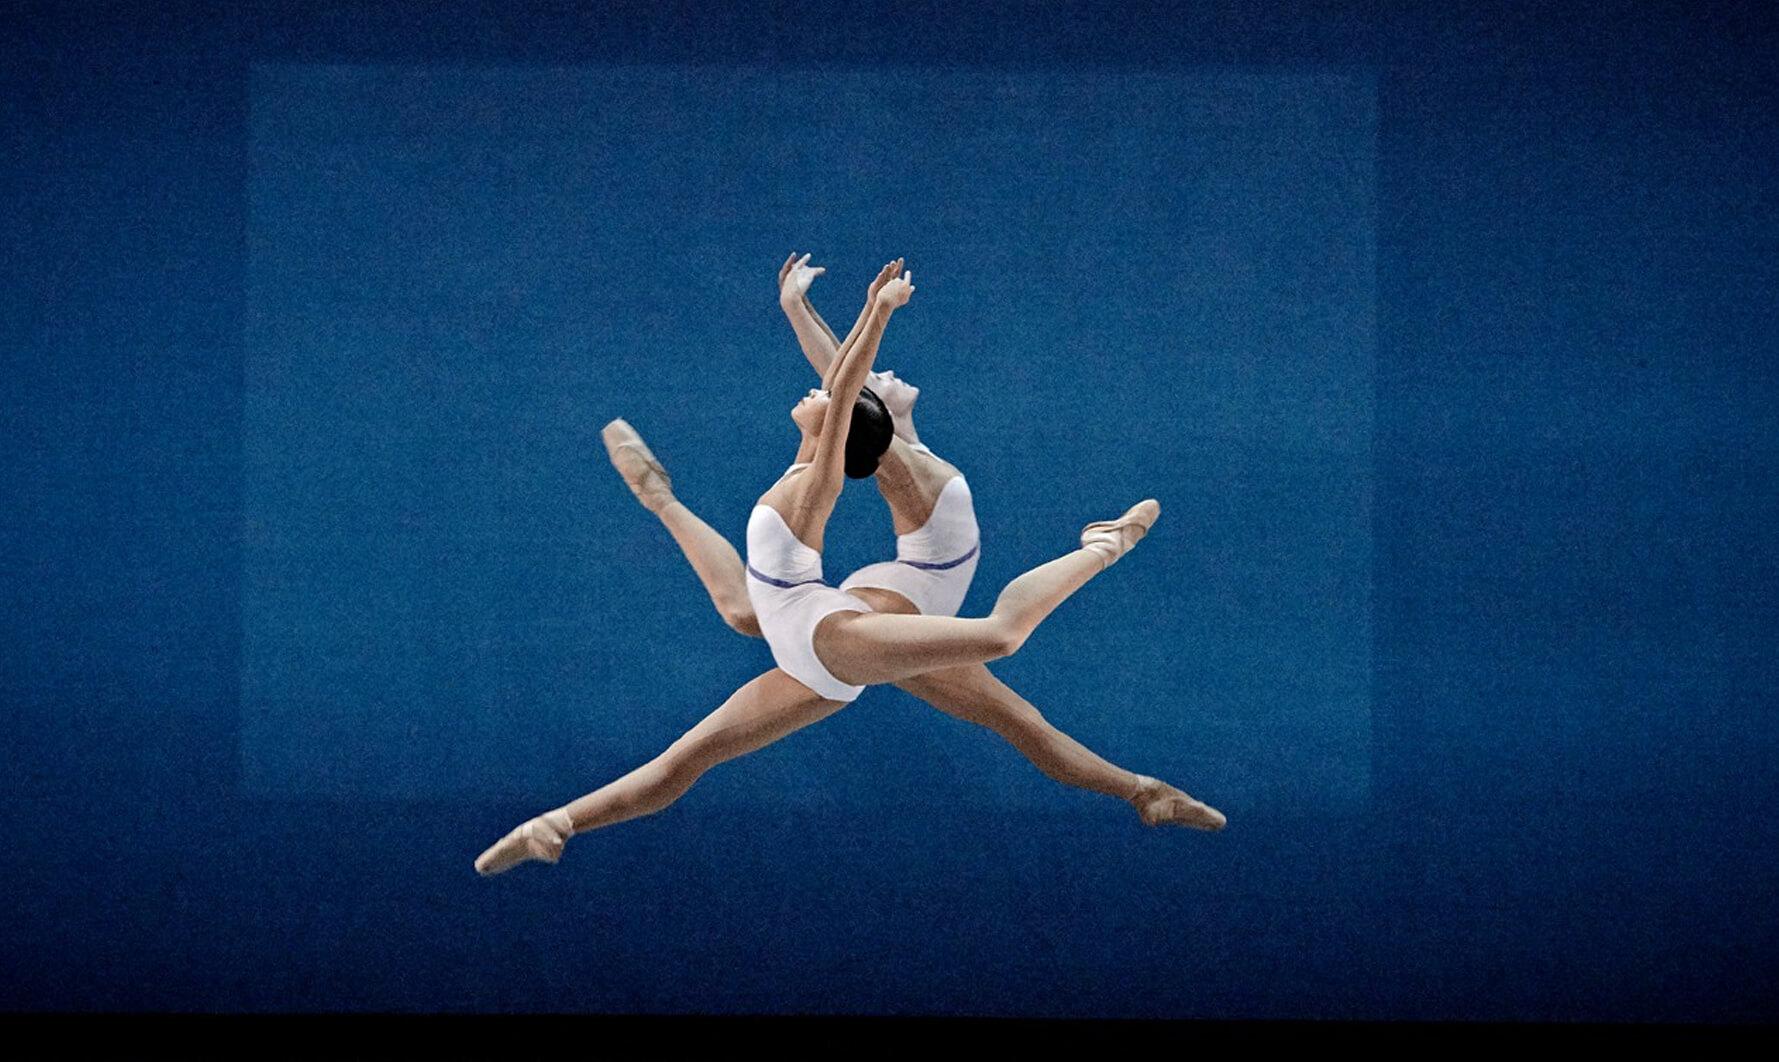 Les Grands Ballets Canadiens de Montreal - Sinfonía N°7 de Beethoven y Stabat Mater de Pergolesi - Director artístico: Iván Cavallari, Italia. Coreógrafo: Uwe Scholz, Alemania. Directora musical: Dina Gilbert, Canadá